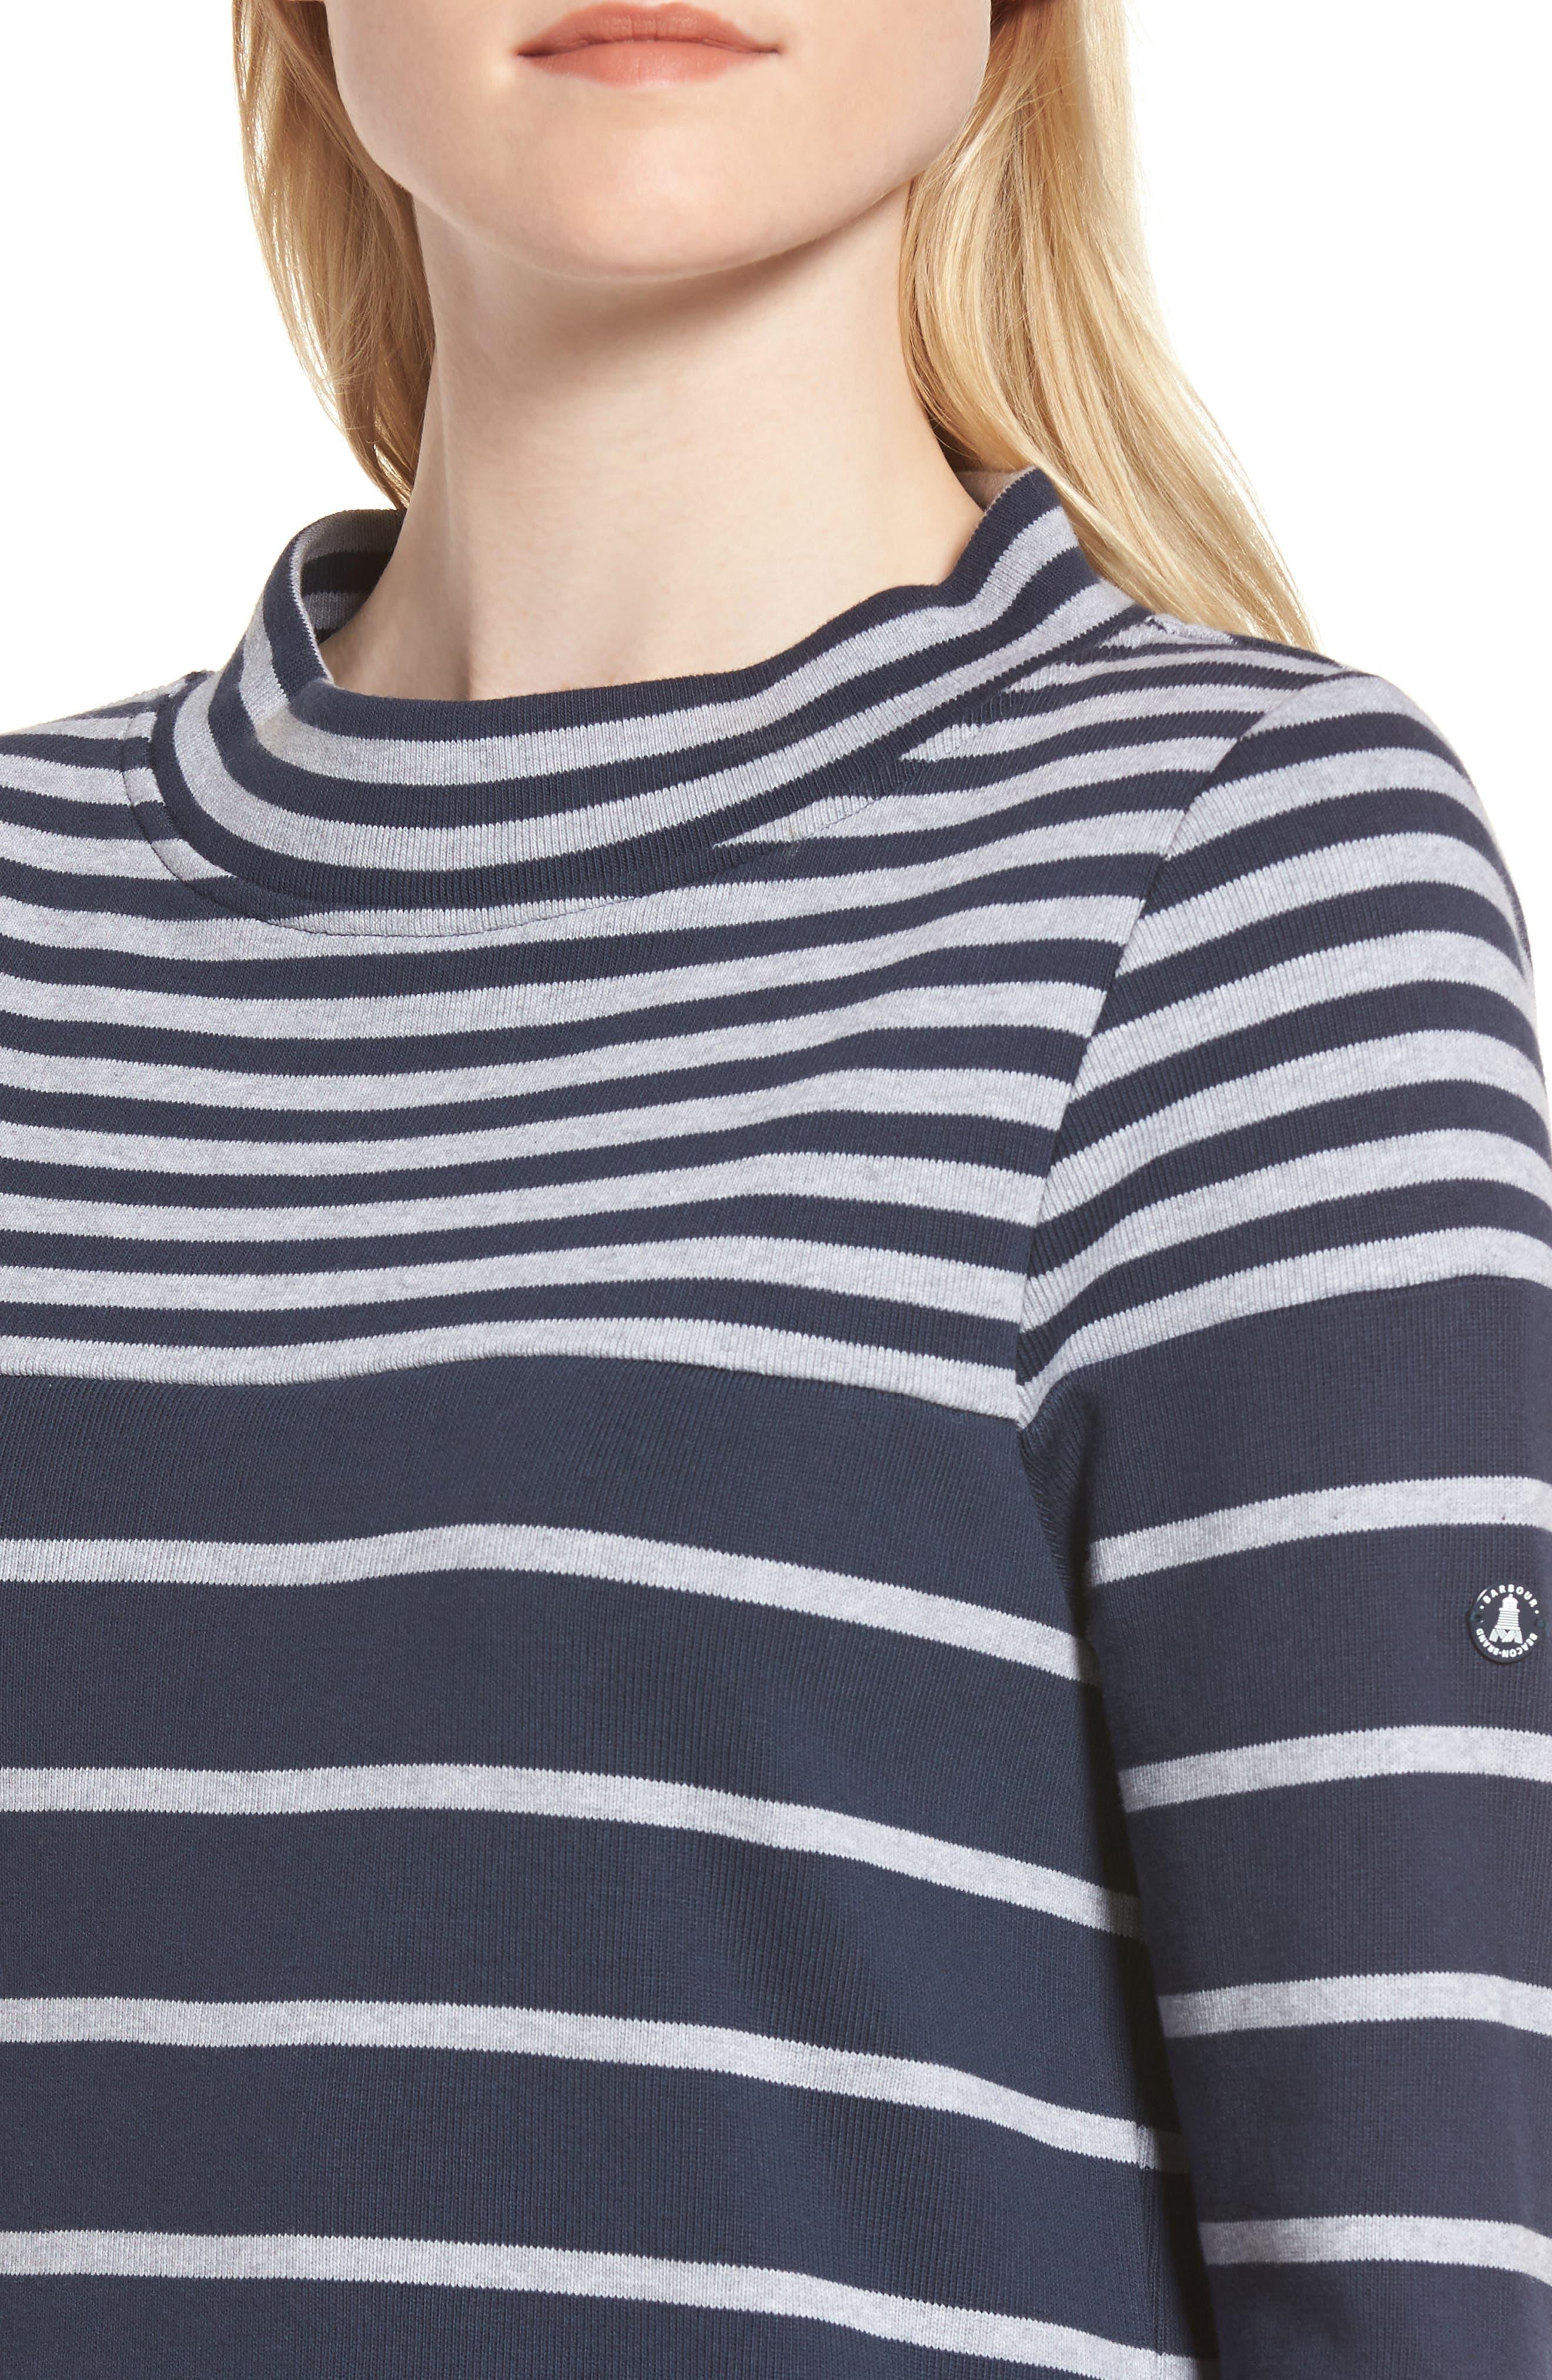 Seaburn Stripe Shift Dress,                             Alternate thumbnail 4, color,                             Navy